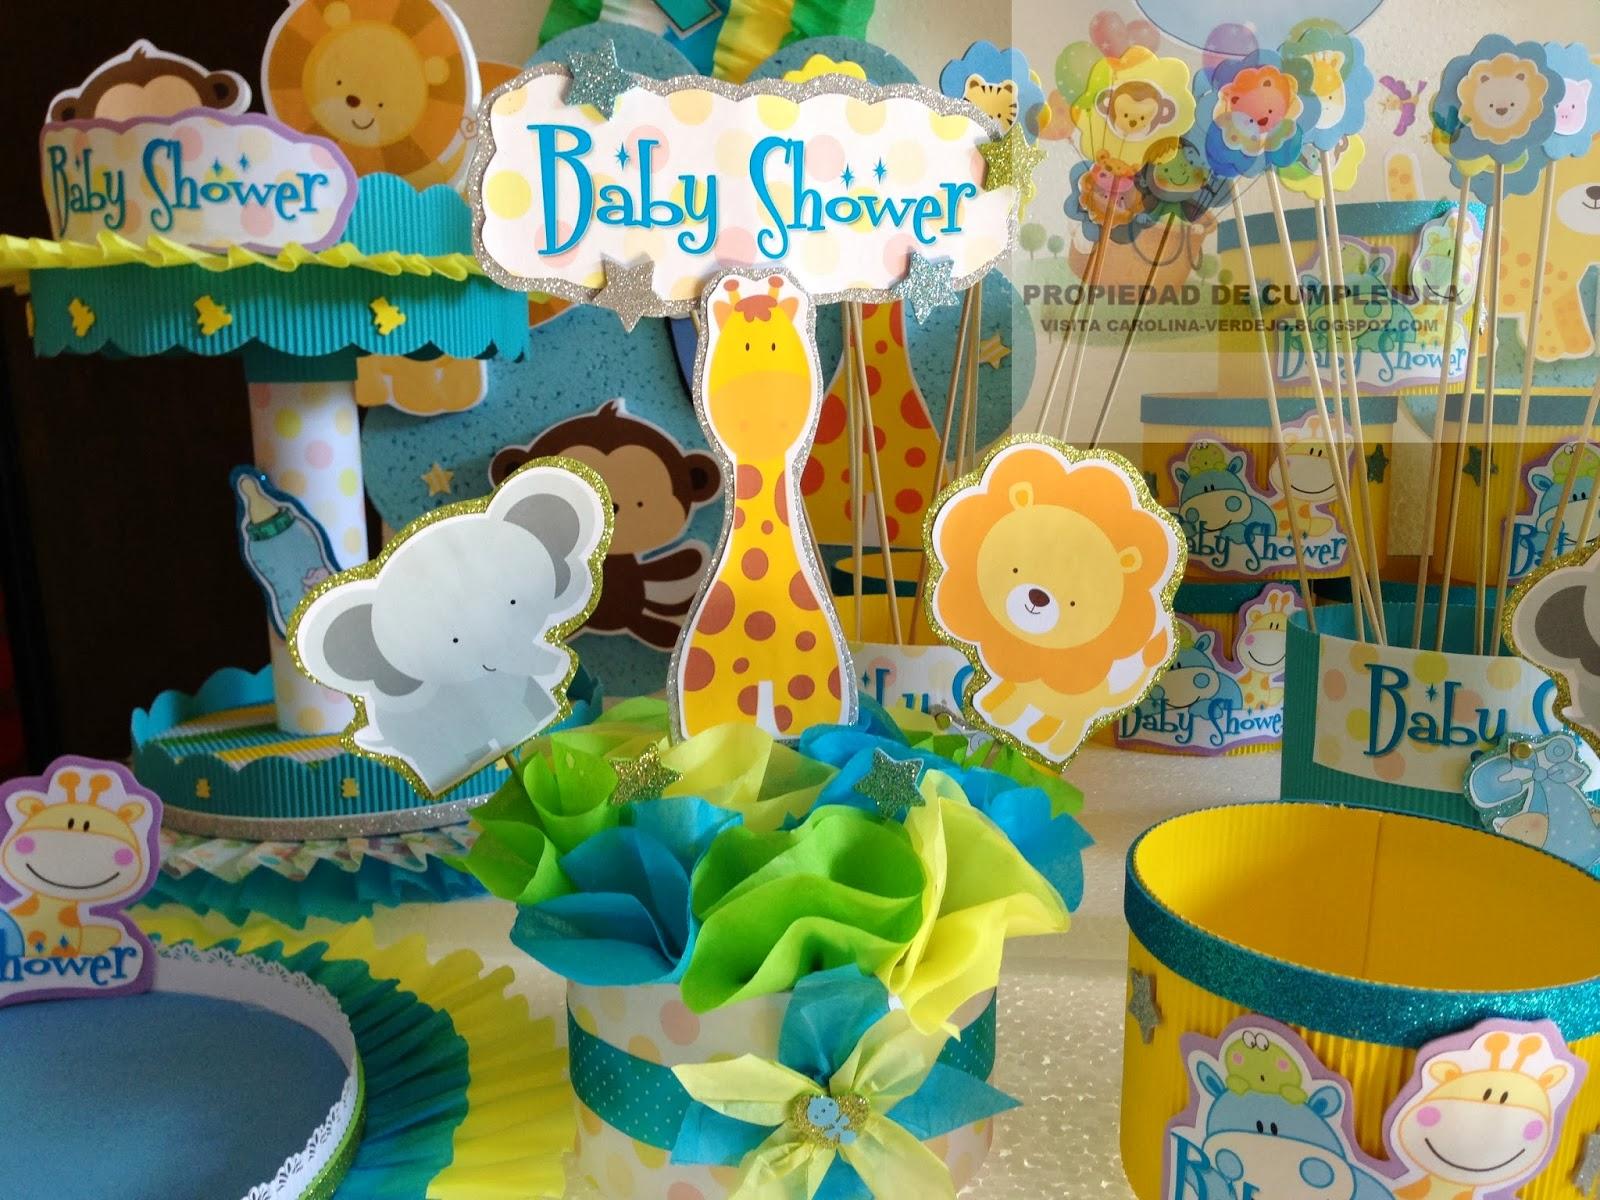 Decoracion baby shower varon con animalitos - Adornos baby shower nino ...